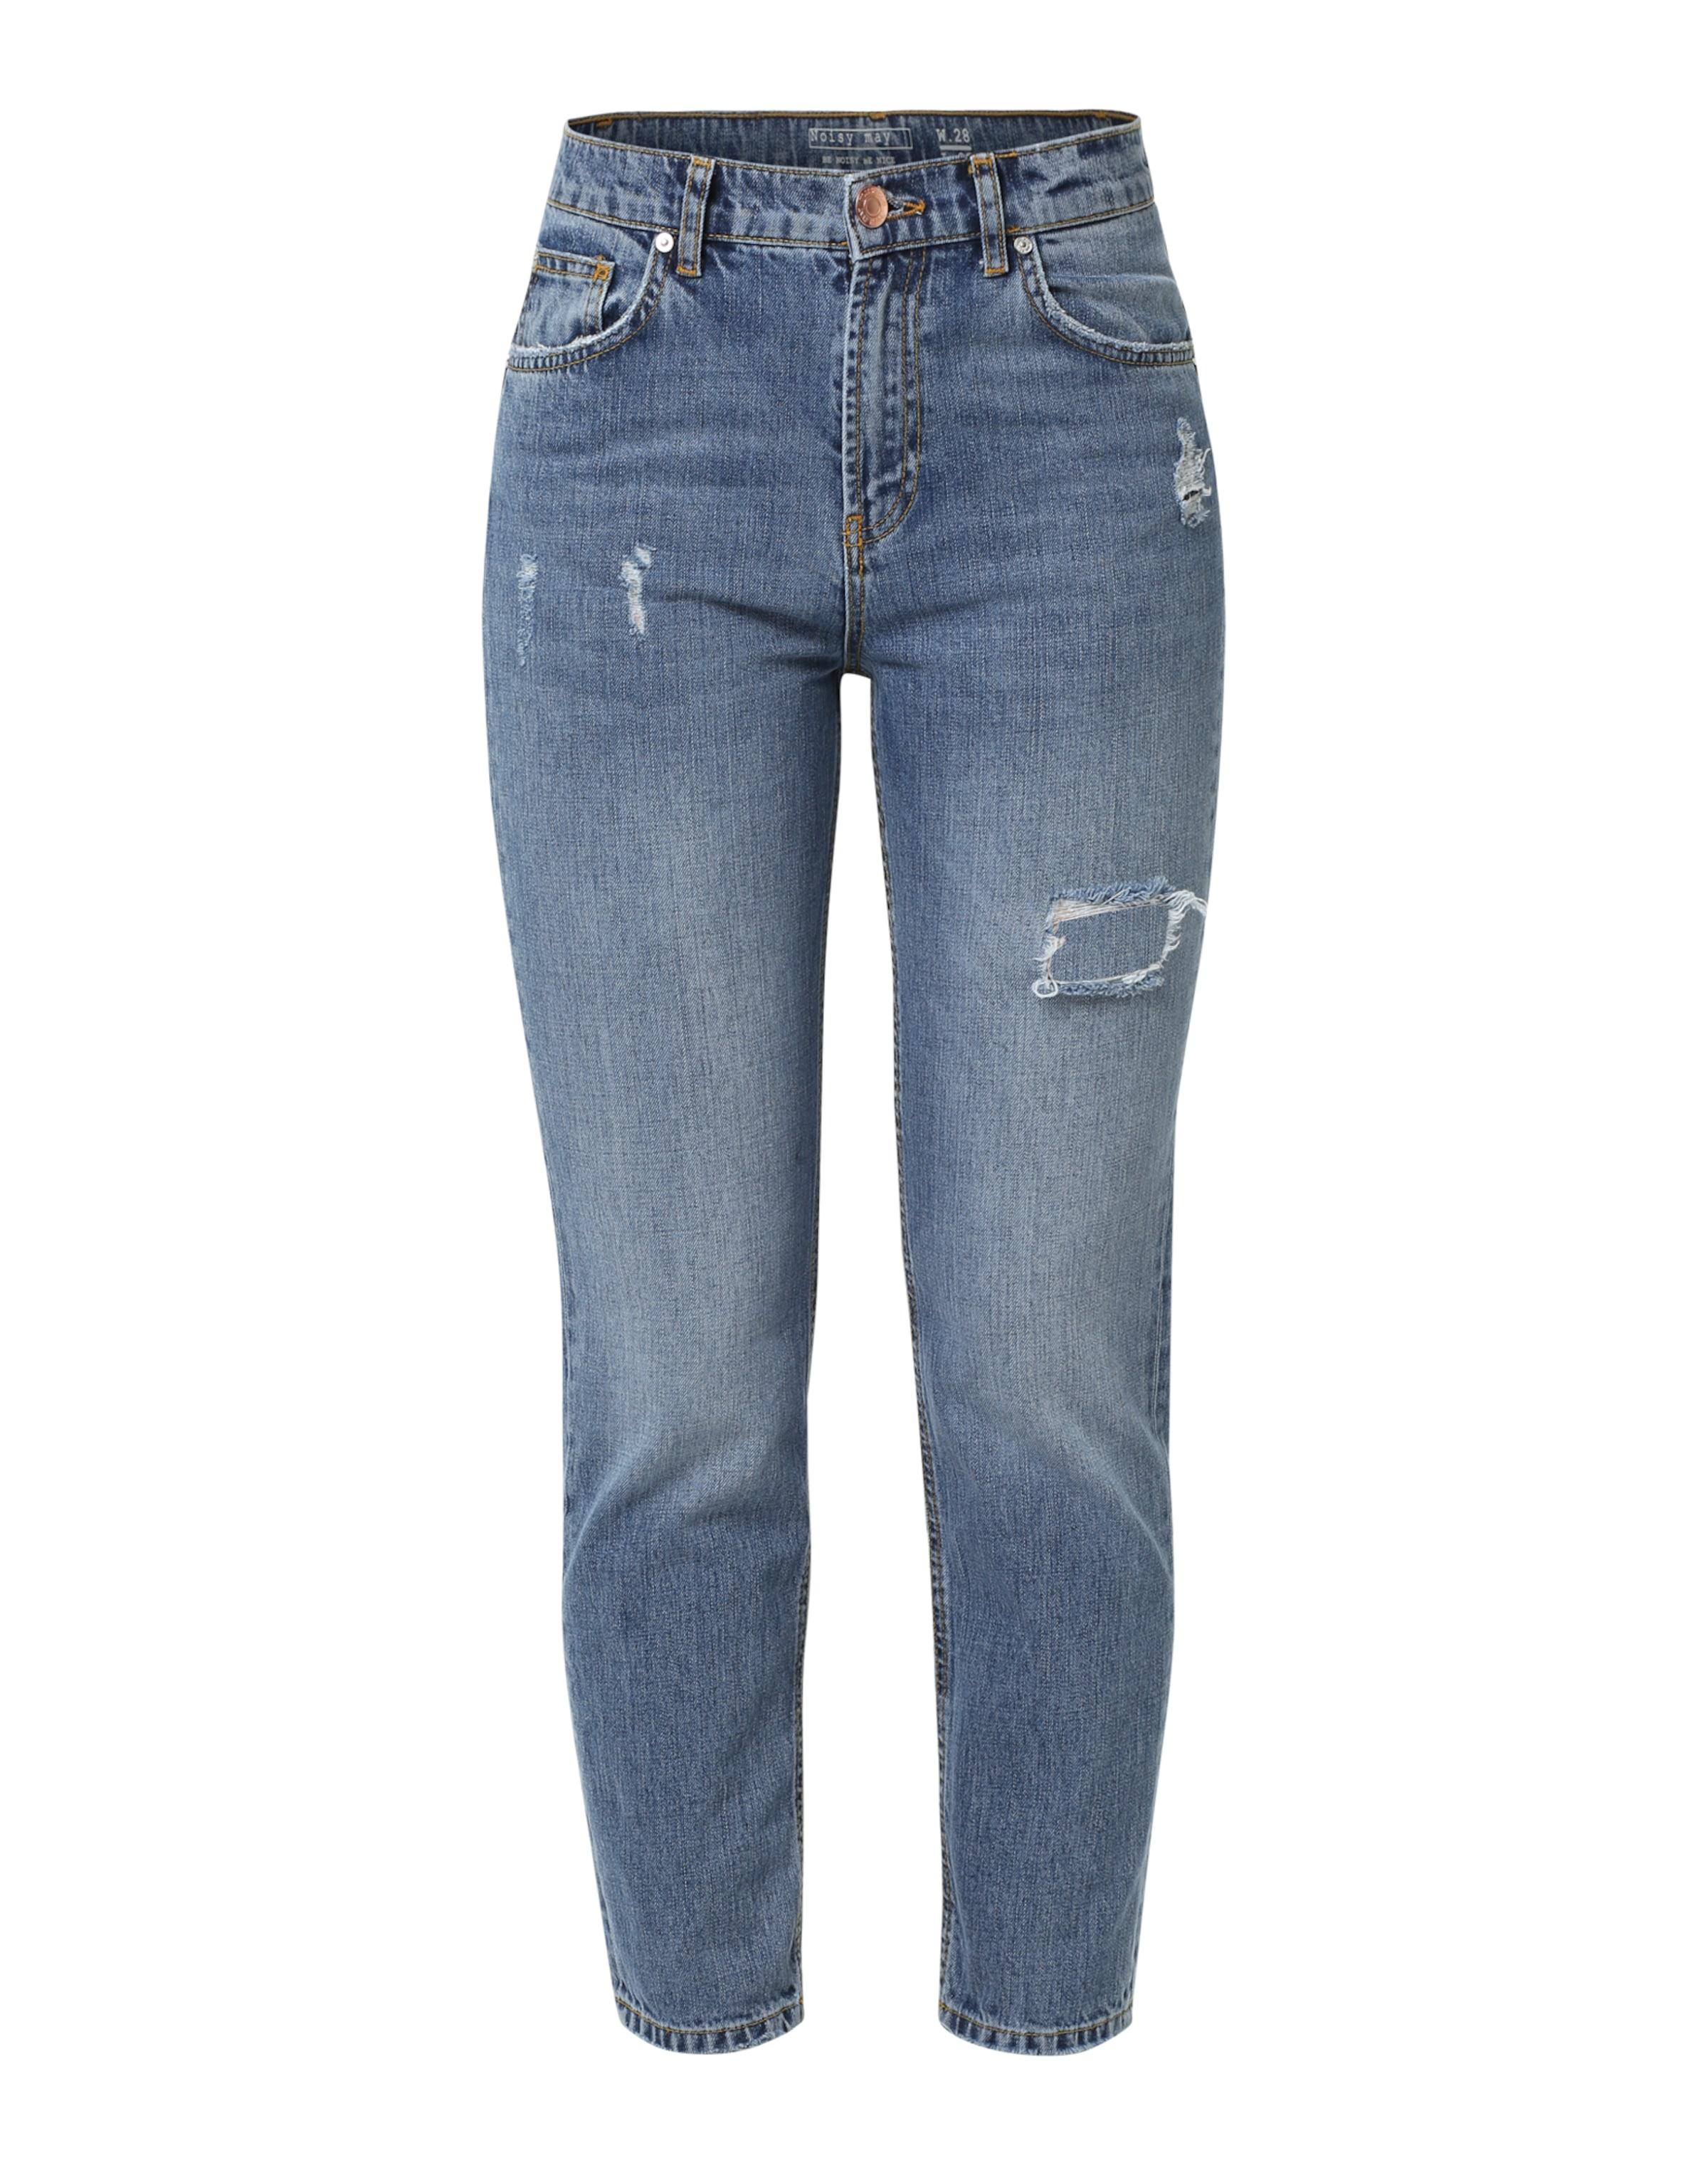 Ankle Jeans May En Bleu Jean Noisy 'nmliv Dest Ba608' Nw Straight 0PkwnO